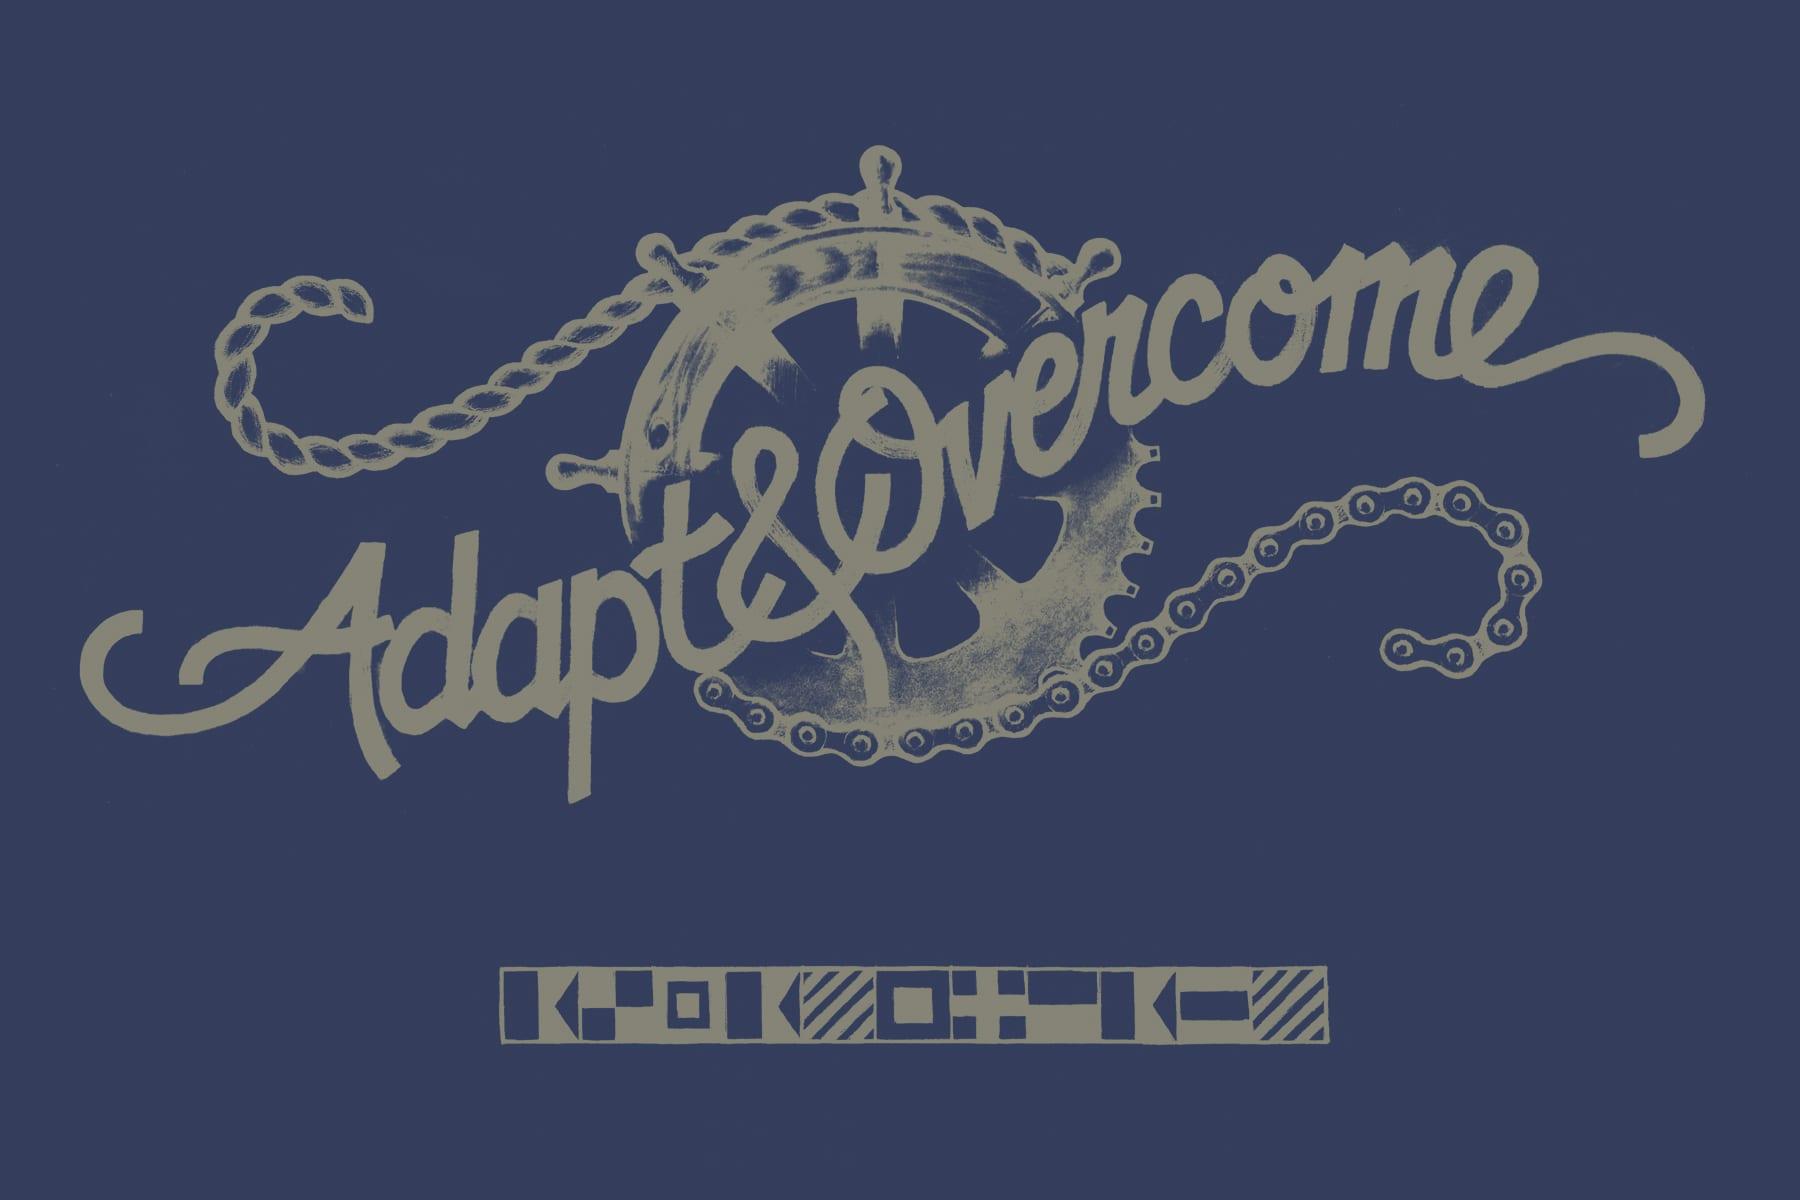 Adapt & Overcome (2012)